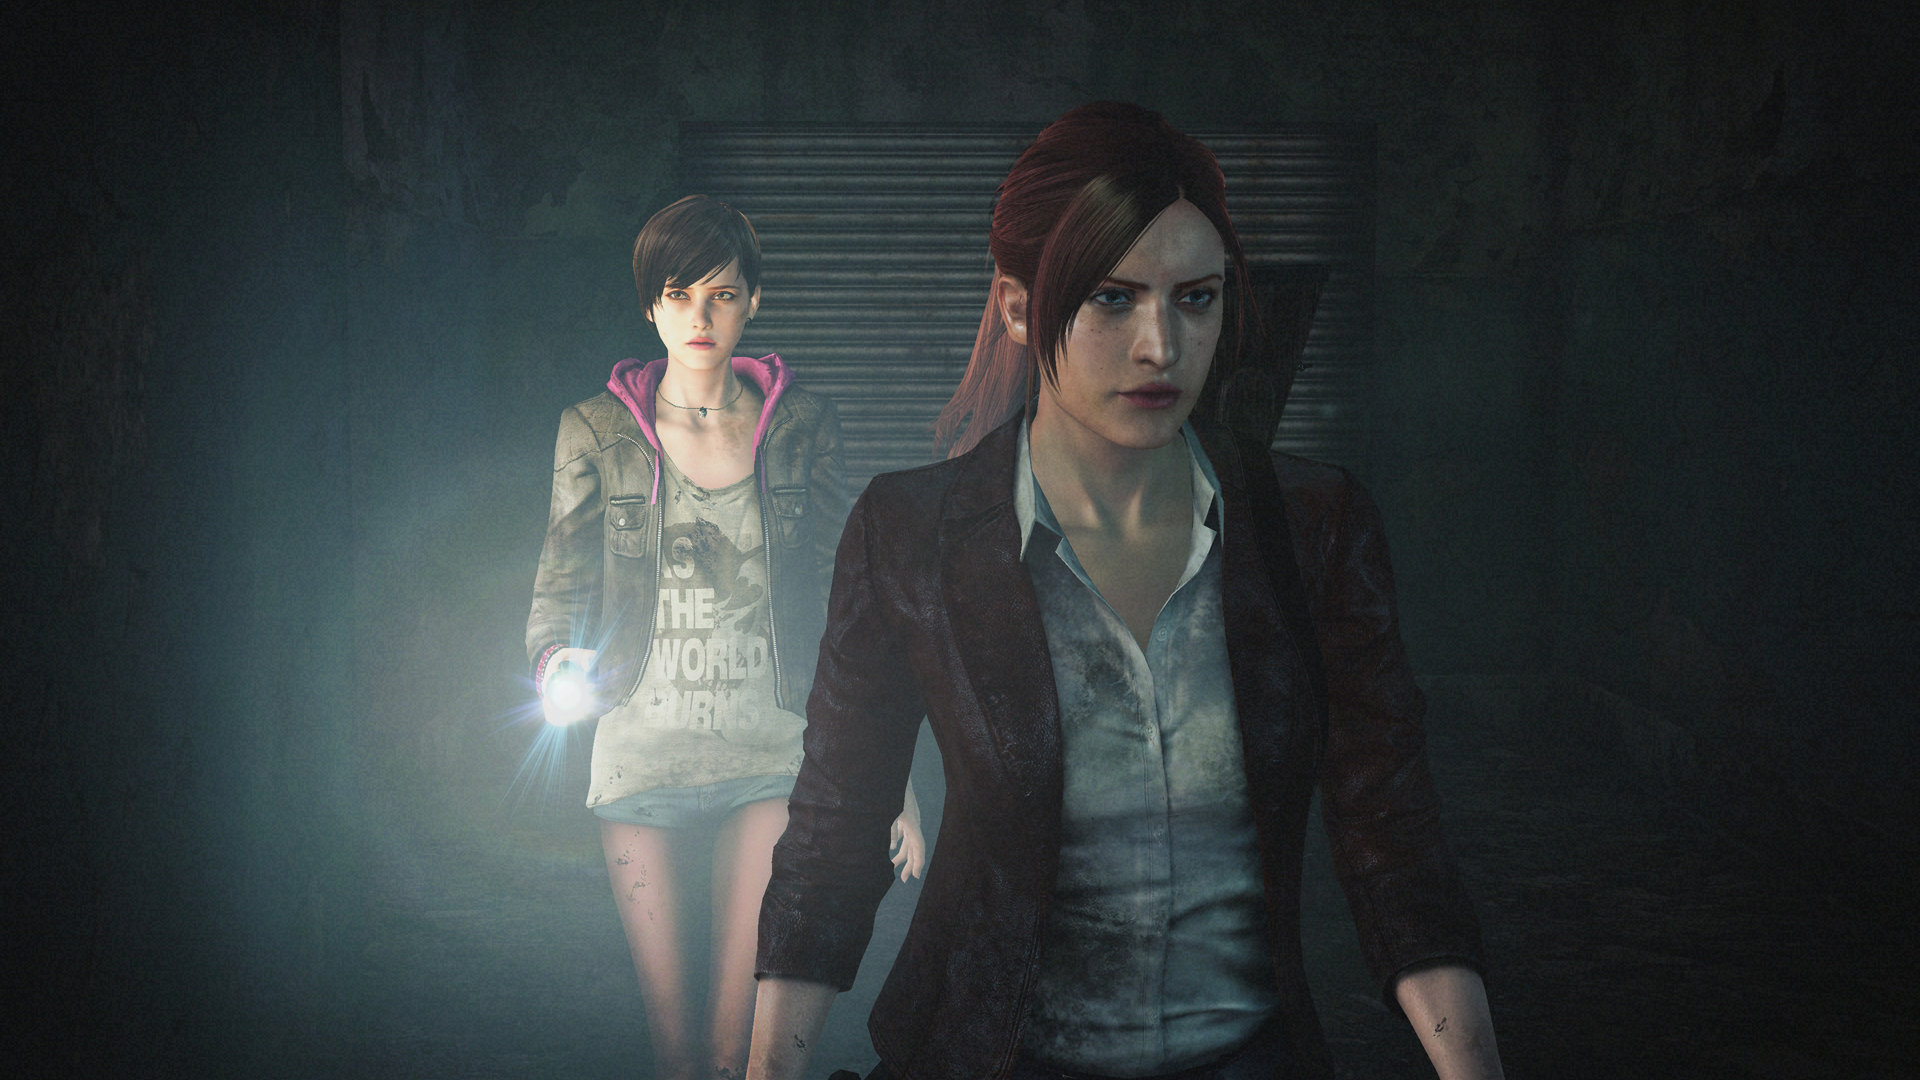 Resident Evil Revelations 2 ESPAÑOL PC Full + Update 2.1 (CODEX) + REPACK 3 DVD5 (JPW) 2